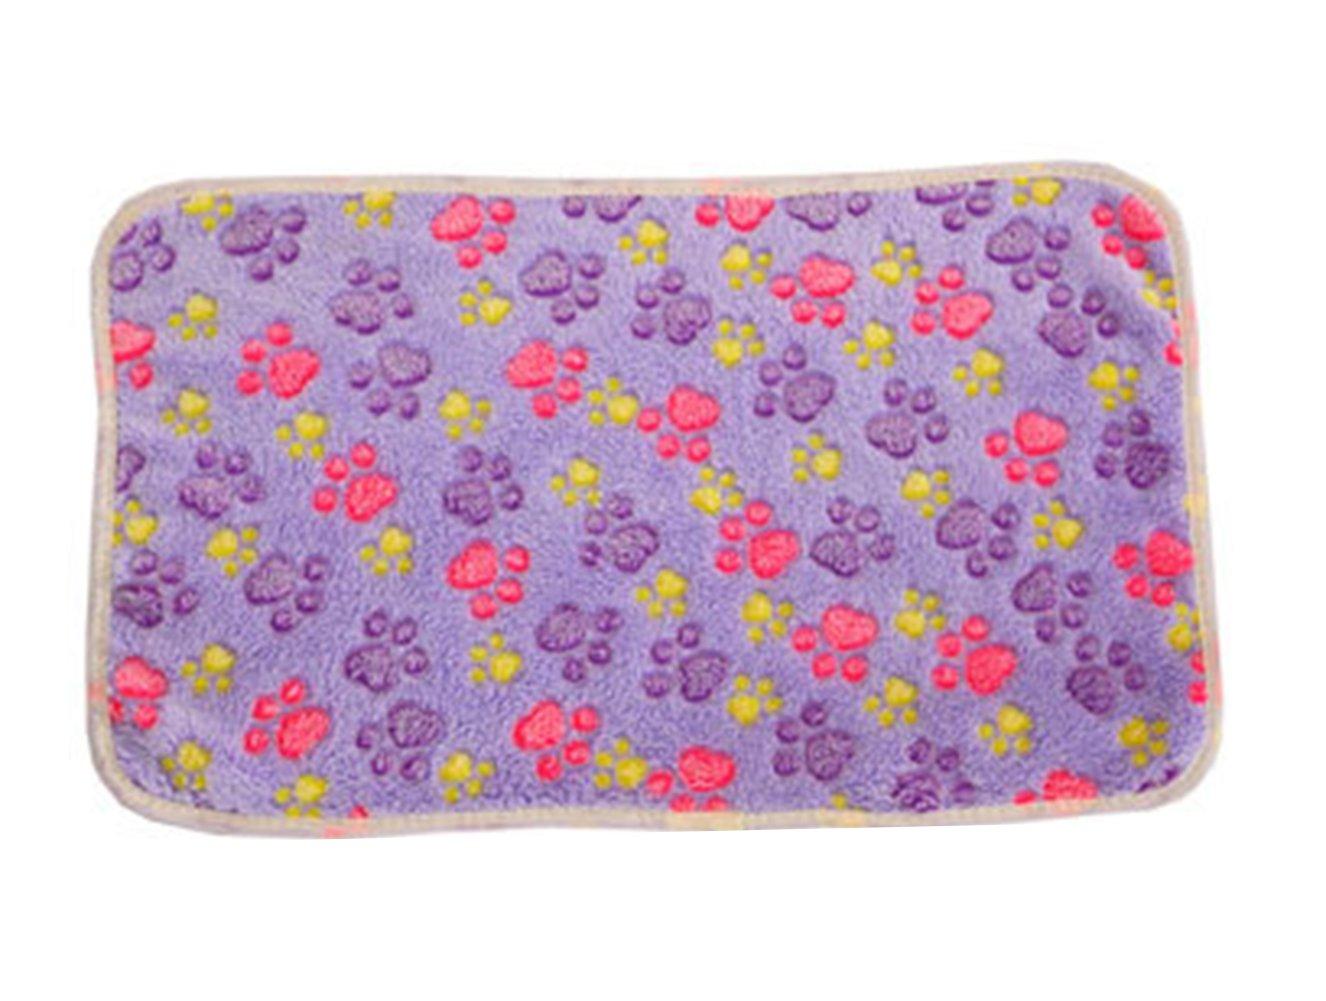 Cdet Cobija pequeño pañuelo de cachorro de perro puppy paño de malla suave suministros para mascotas 20*20cm,Caqui